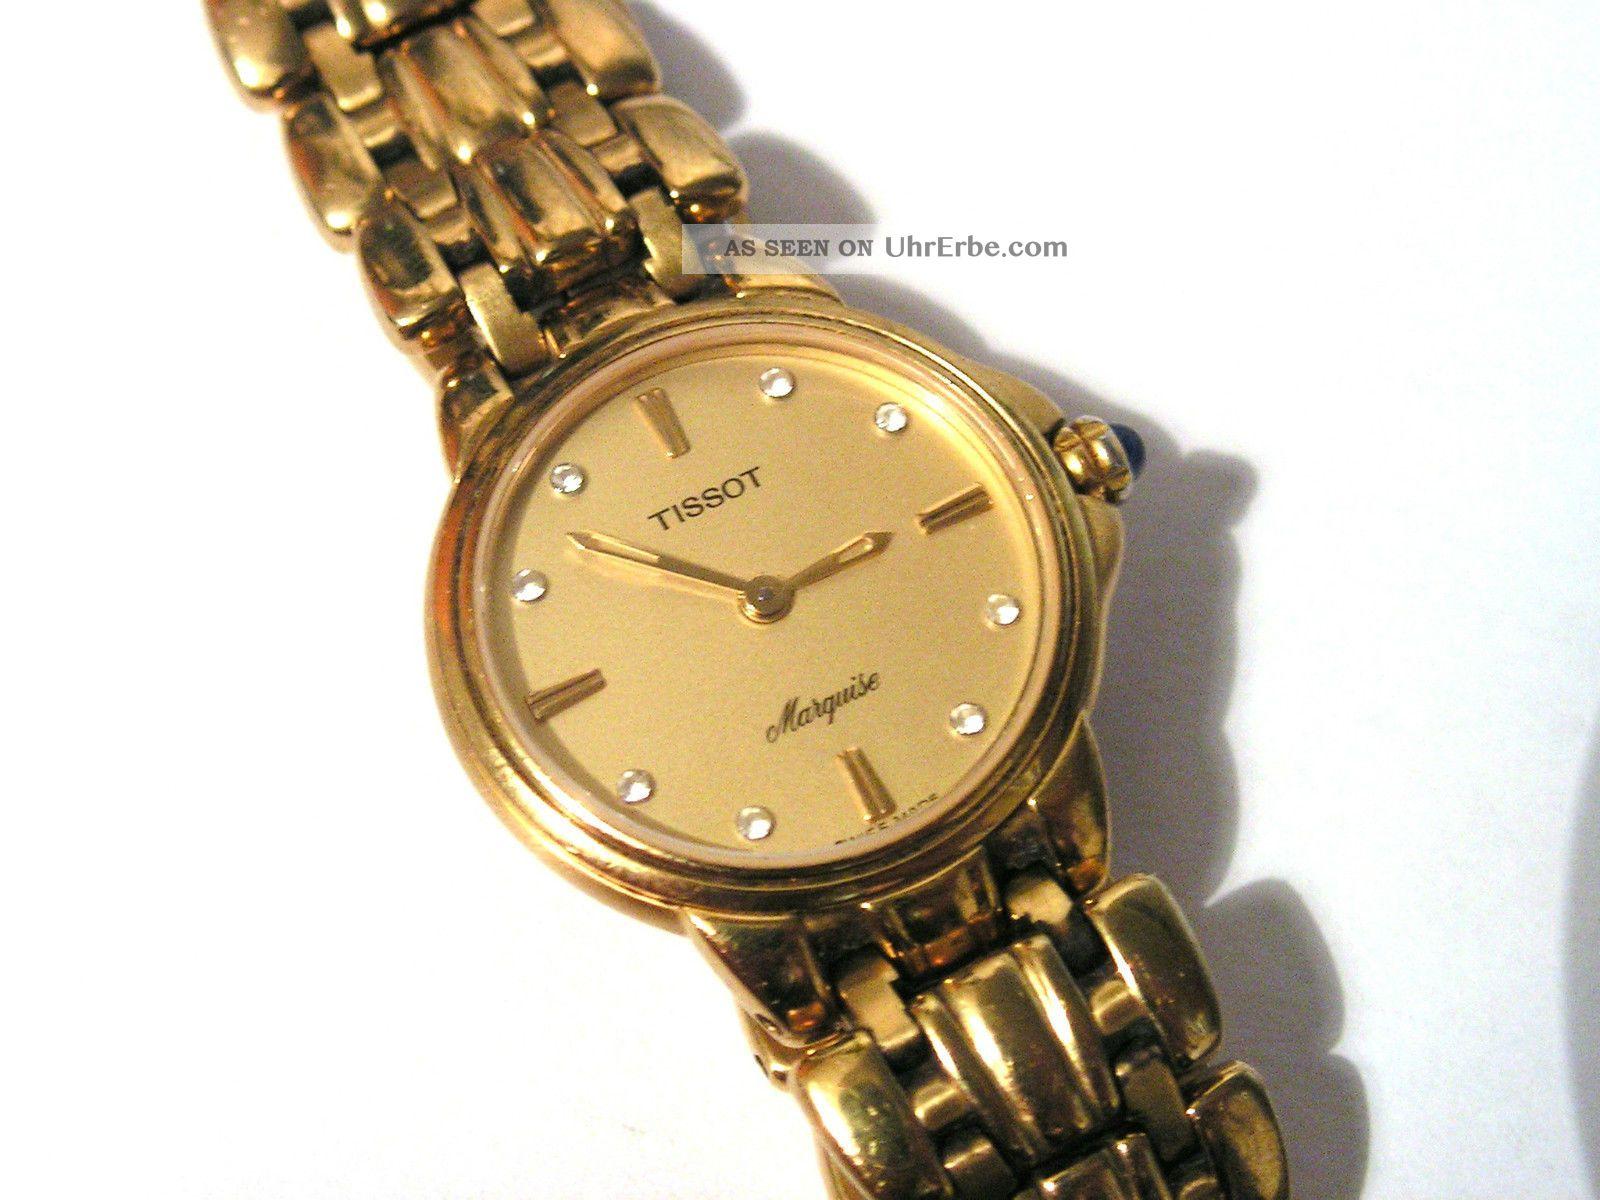 Klassisch & Edel Tissot Marquise Damenuhr Armbanduhr Goldfarben Armbanduhren Bild